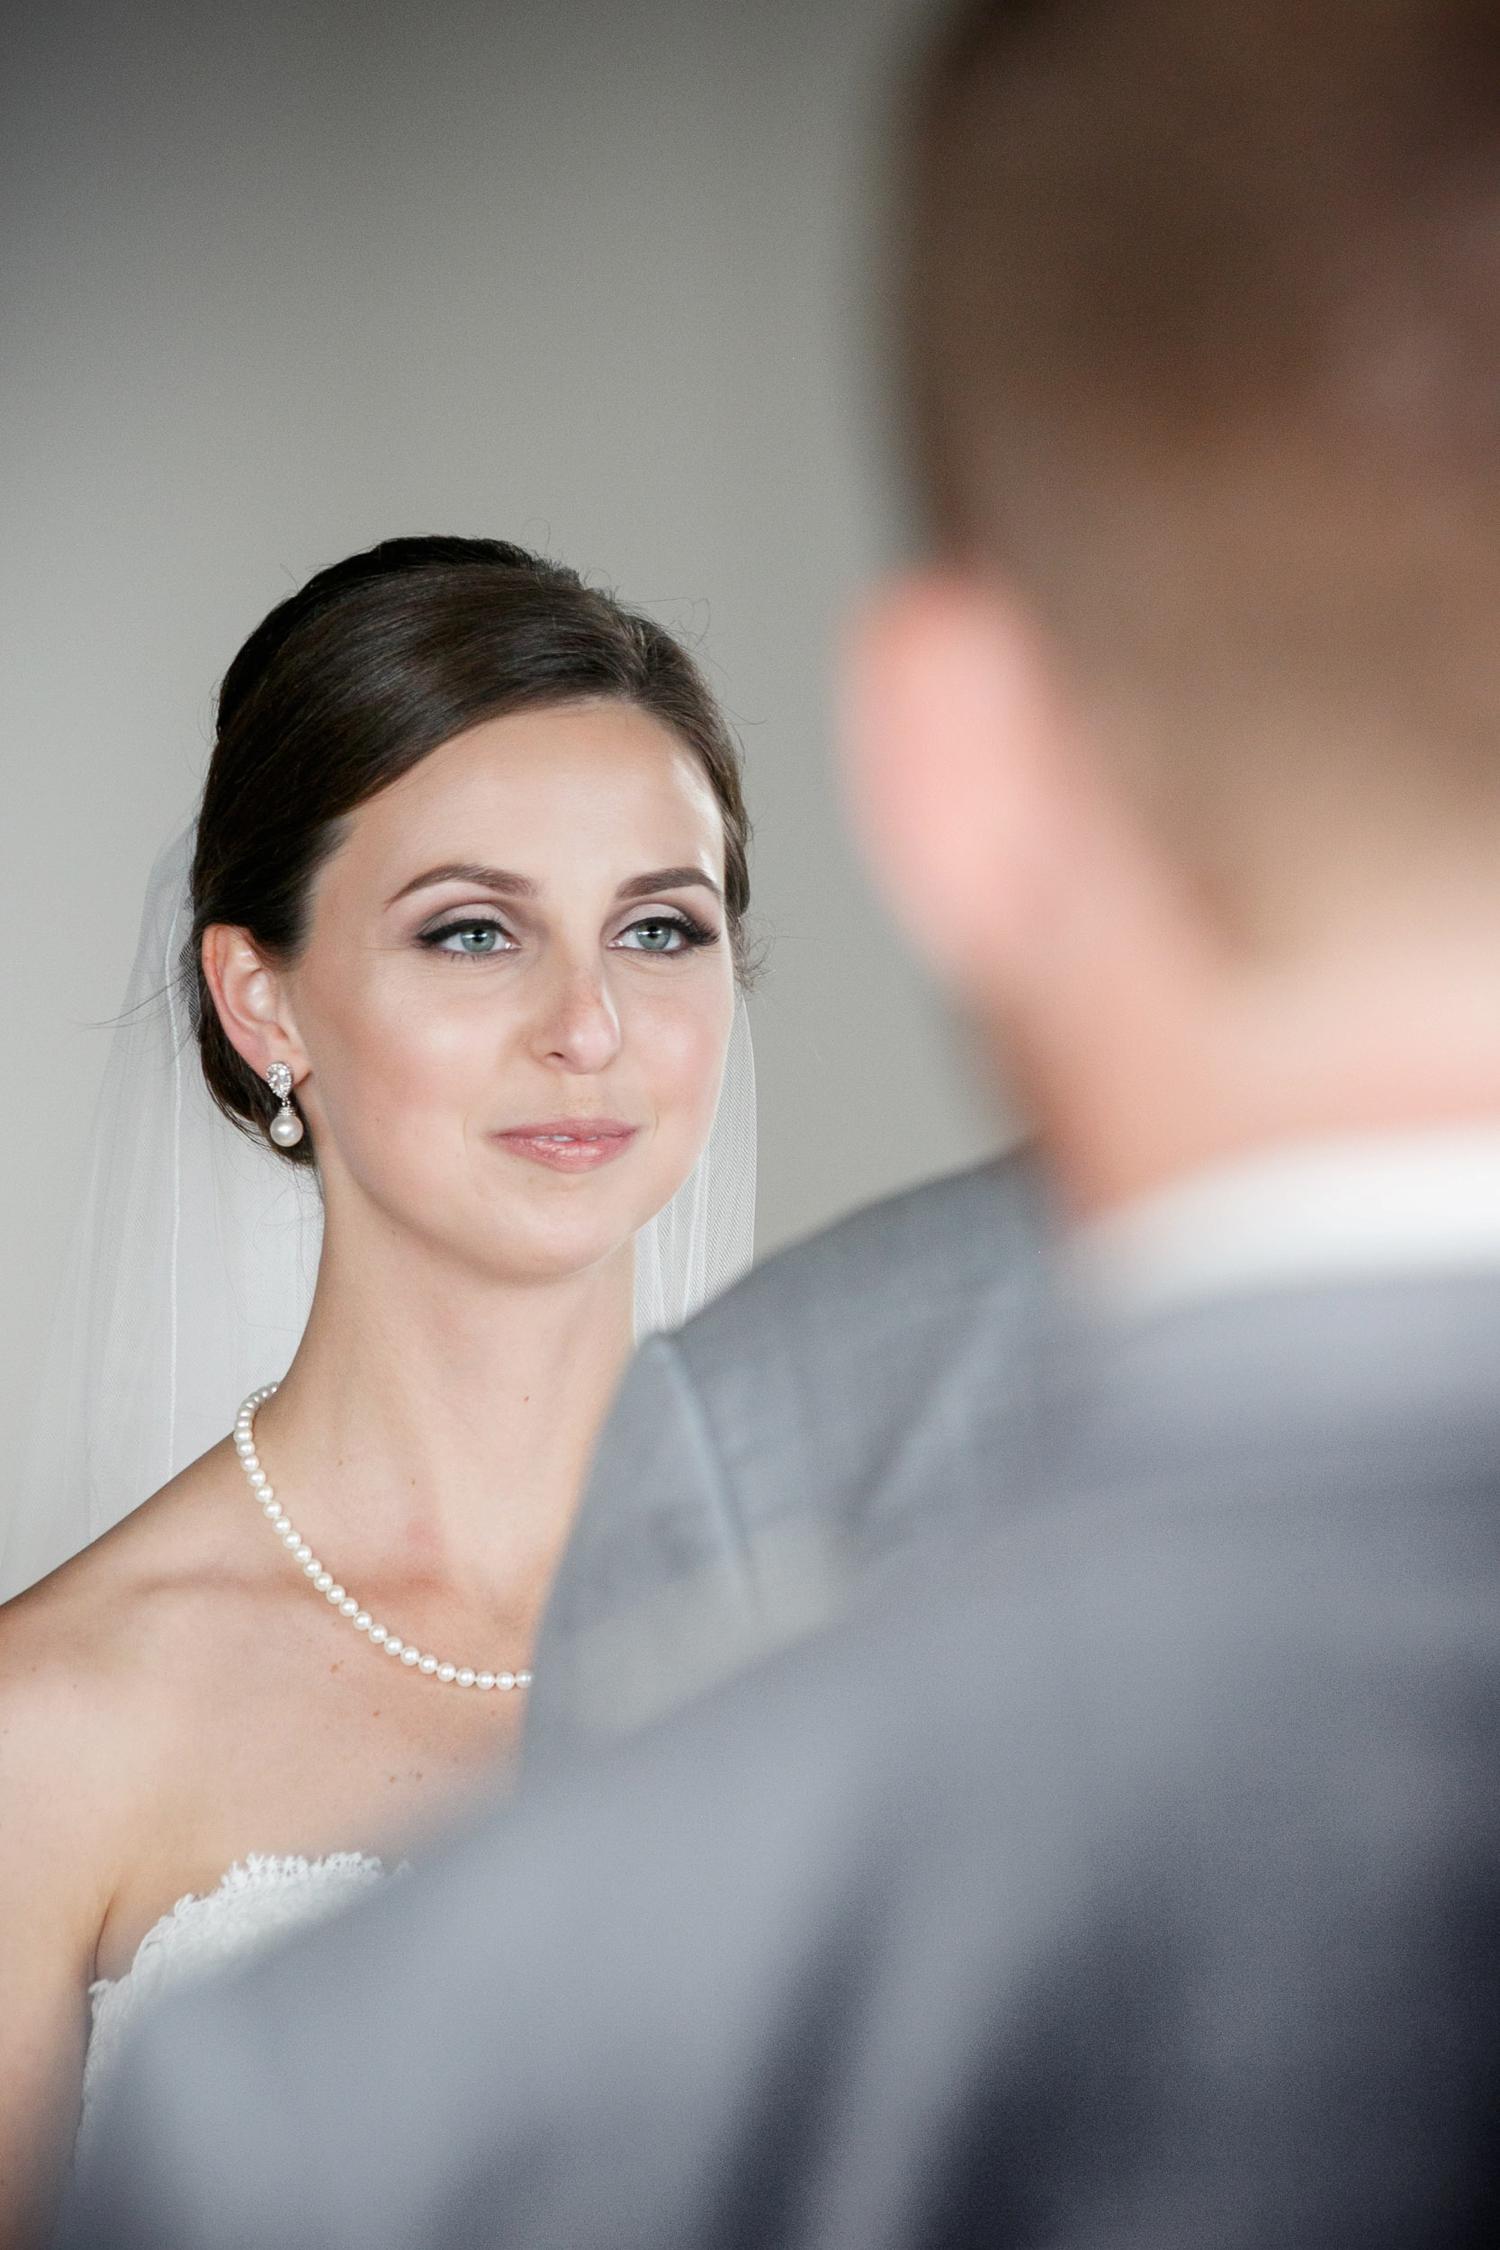 lawrence-university-warch-center-wedding-adam-shea-photography_0025.jpg